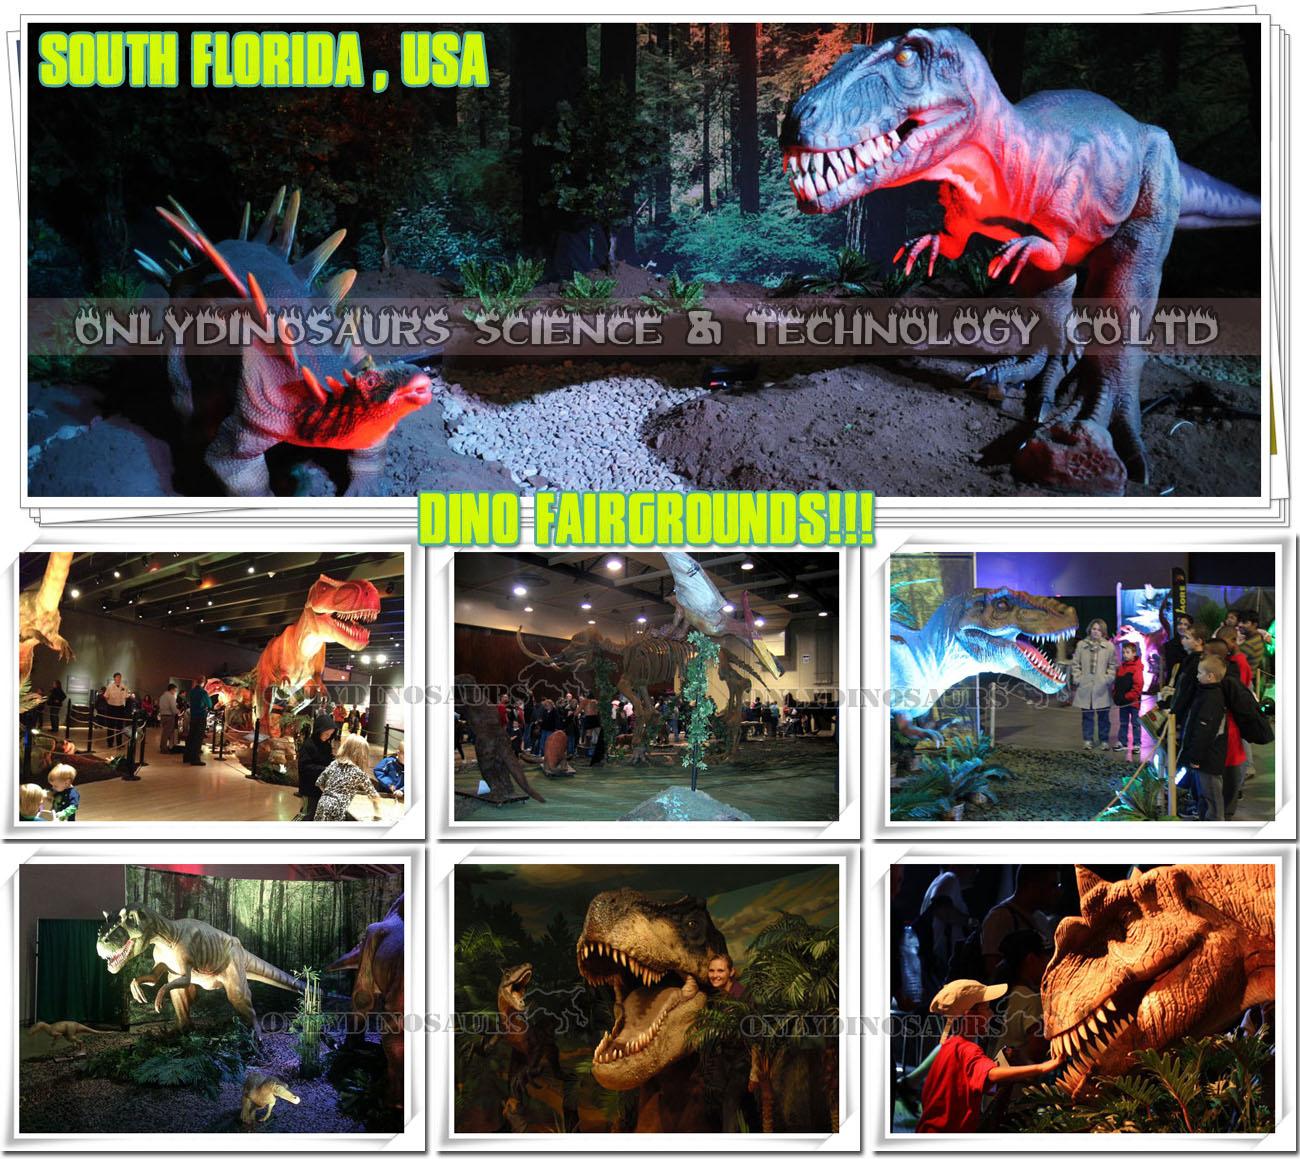 Dinosaur Exhibition in South Florida